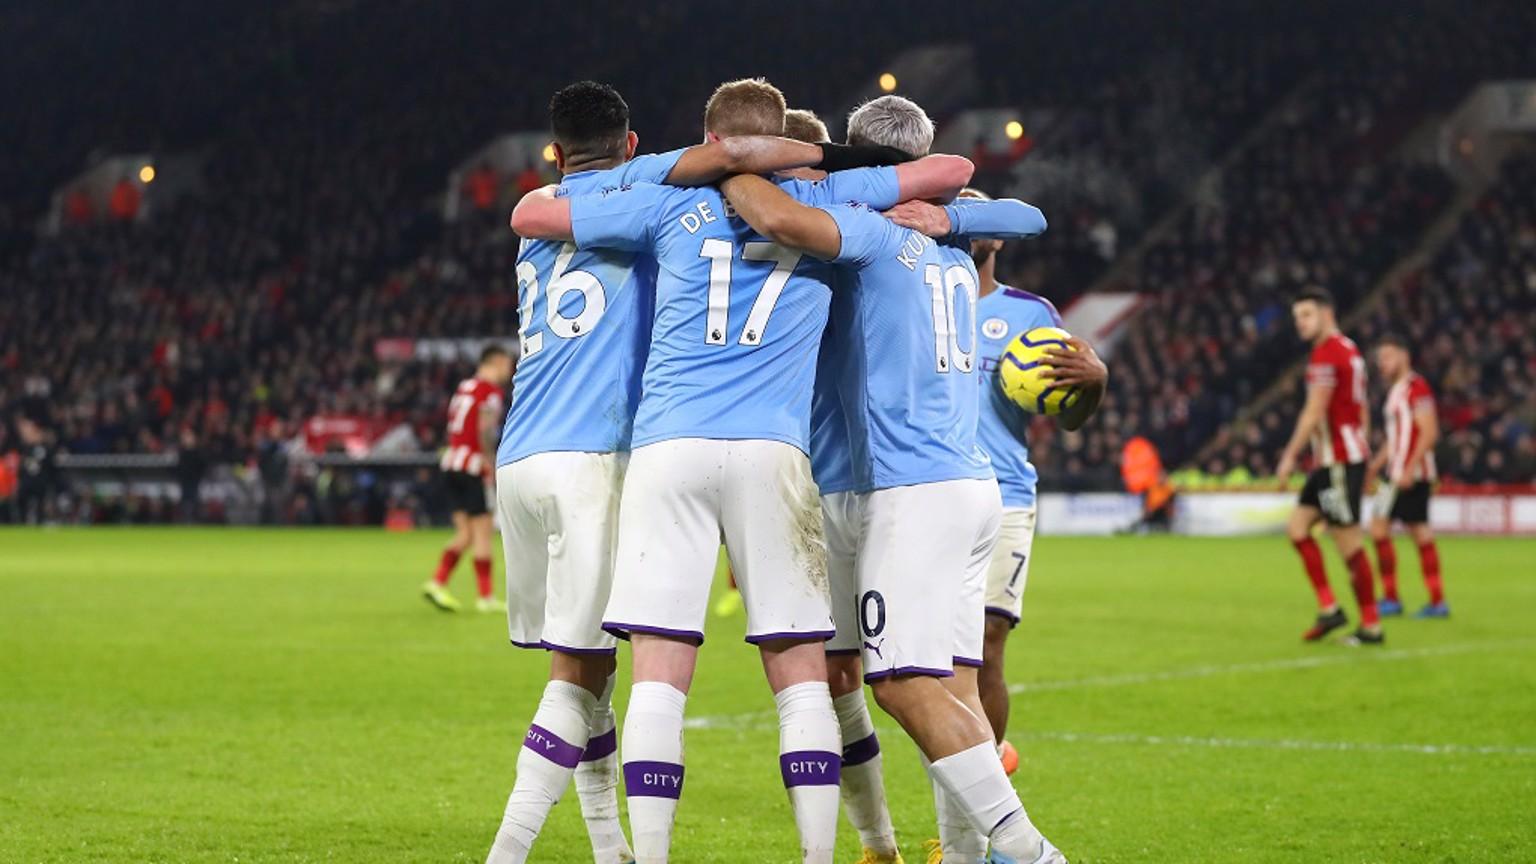 MEMATIKAN: Sergio menciptakan gol kemenangan